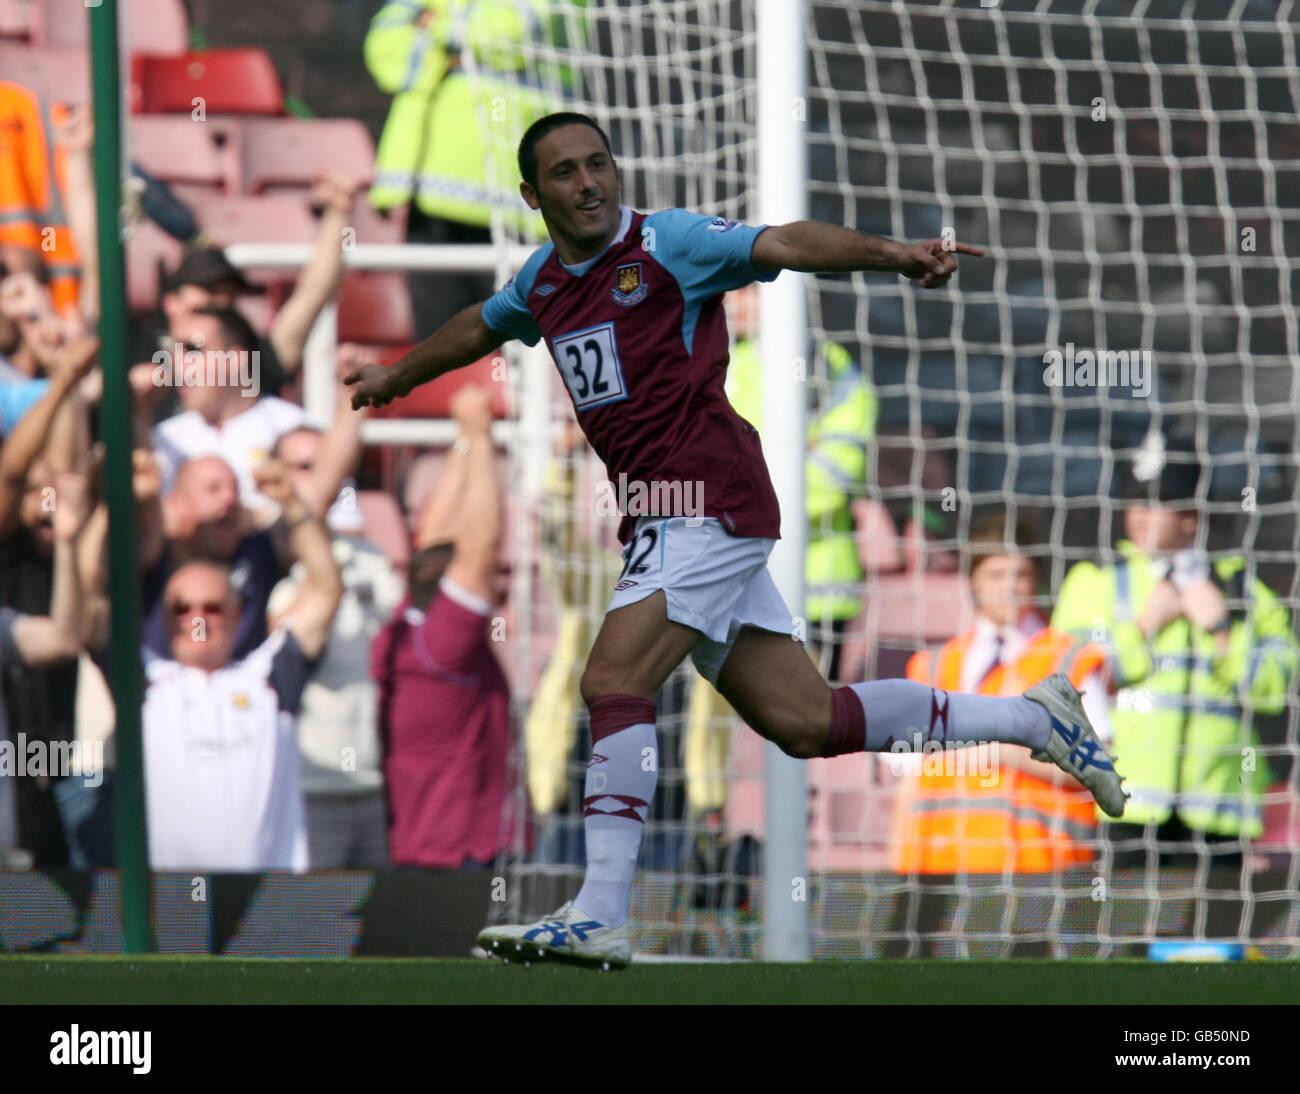 Soccer - Barclays Premier League - West Ham United v Newcastle United - Upton Park - Stock Image